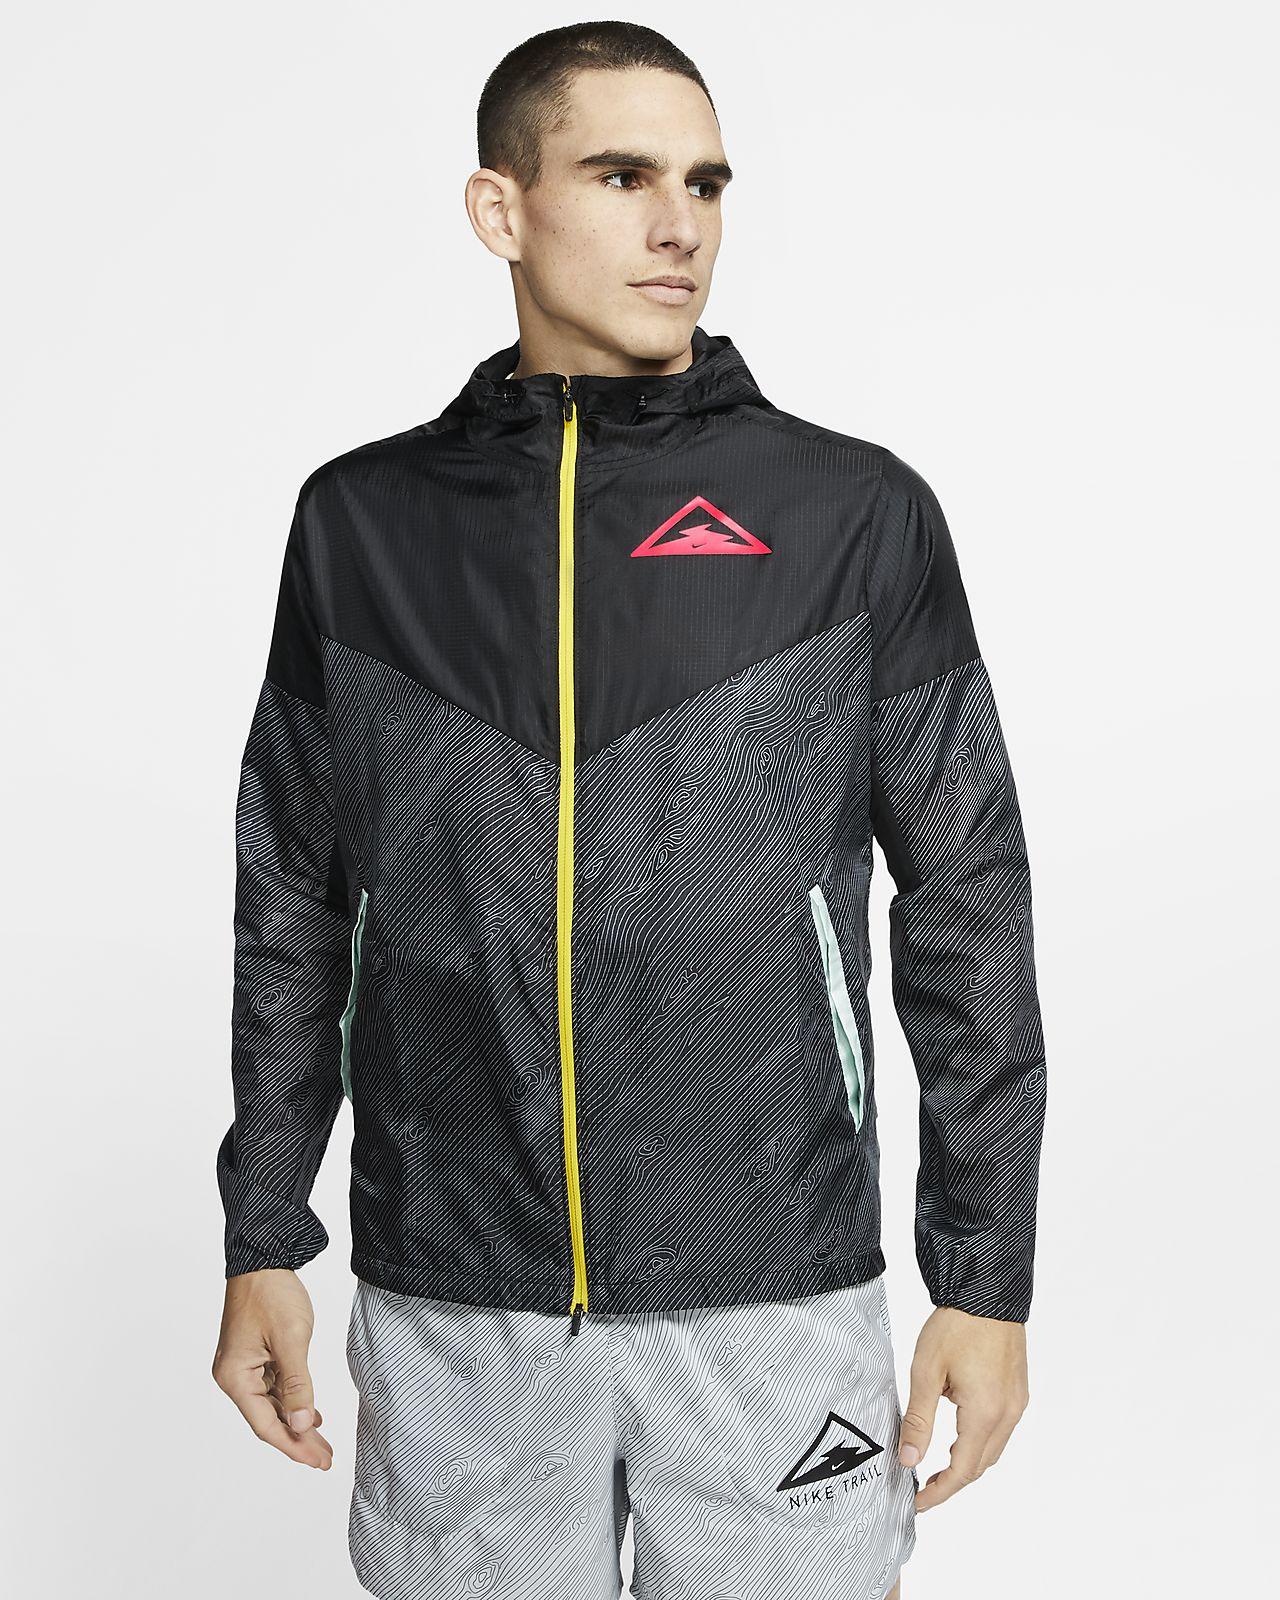 Nike Windrunner Trail-Laufjacke mit Kapuze für Herren